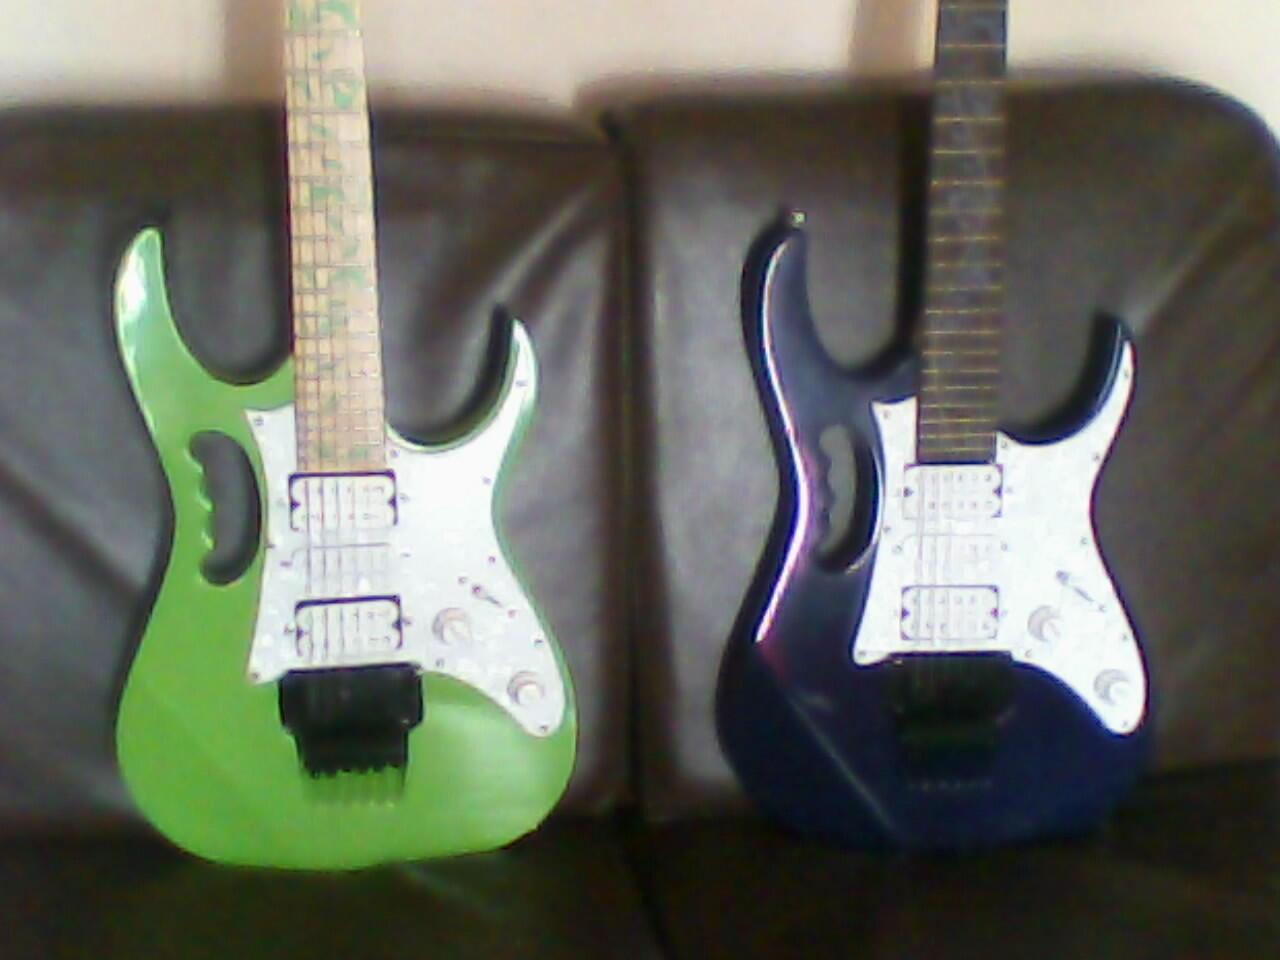 Ane Mau Buka LAPAK Buat Jualan Guitar Custom Buatan Pabrikan Bandung. Source: http:/